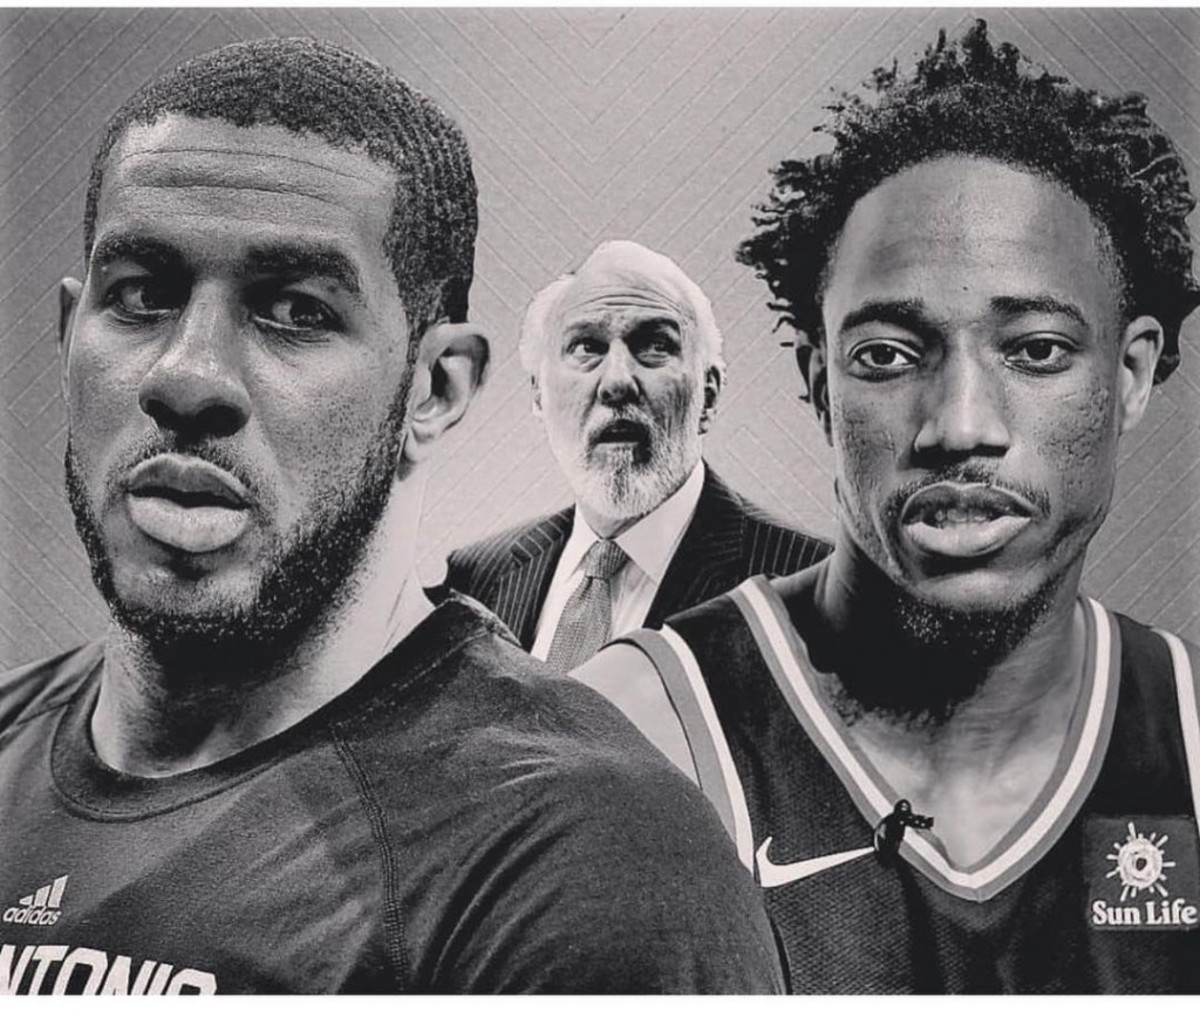 Spurs 2019